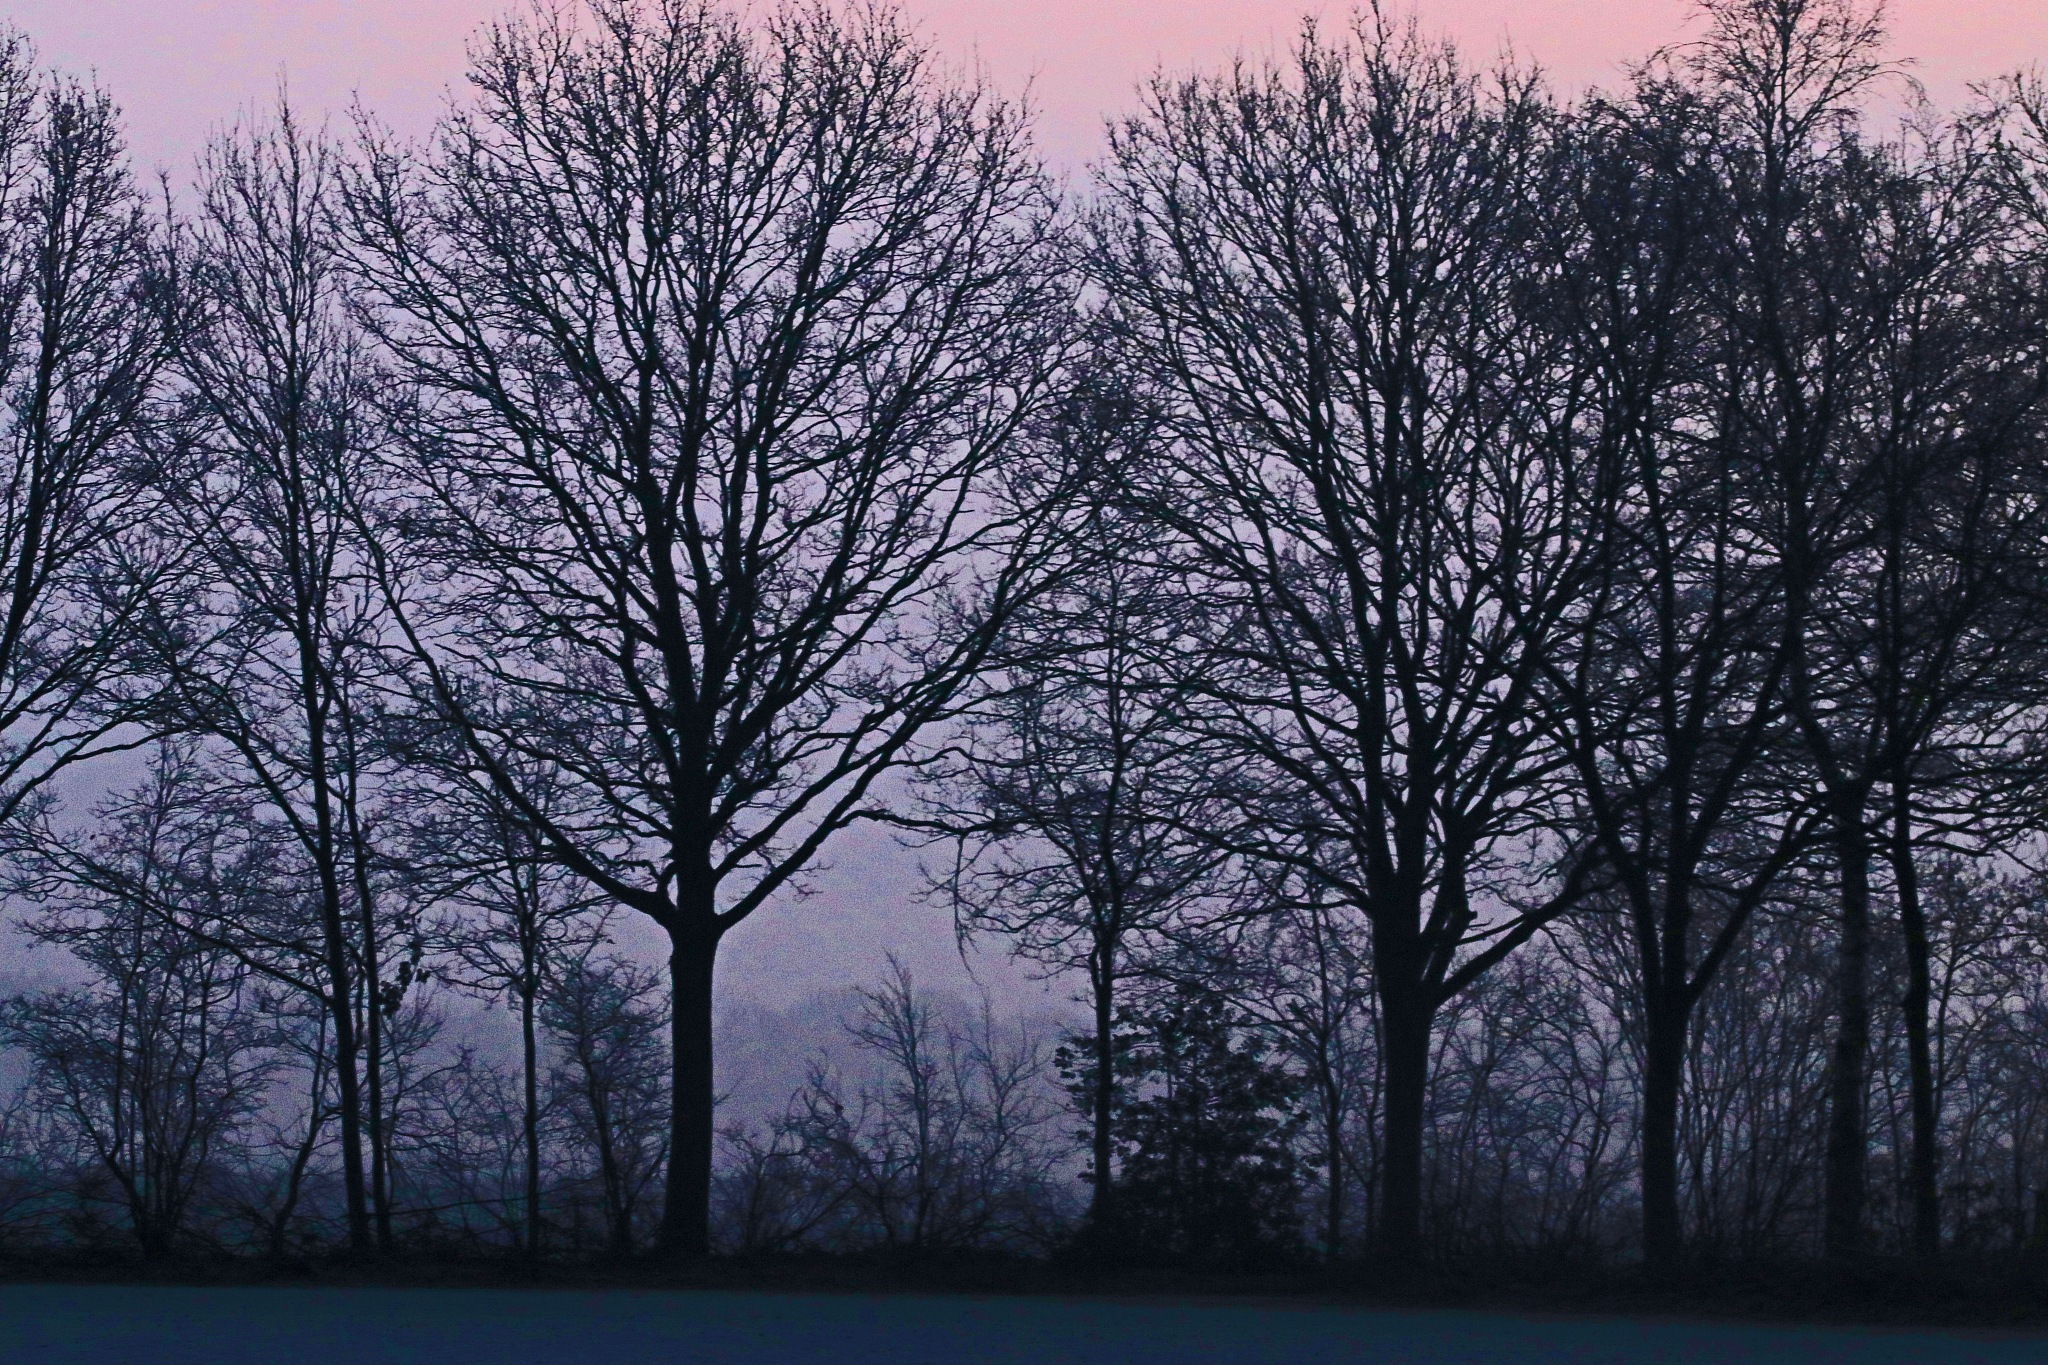 trees in the morning by Jeroen Wouter van der Vlist